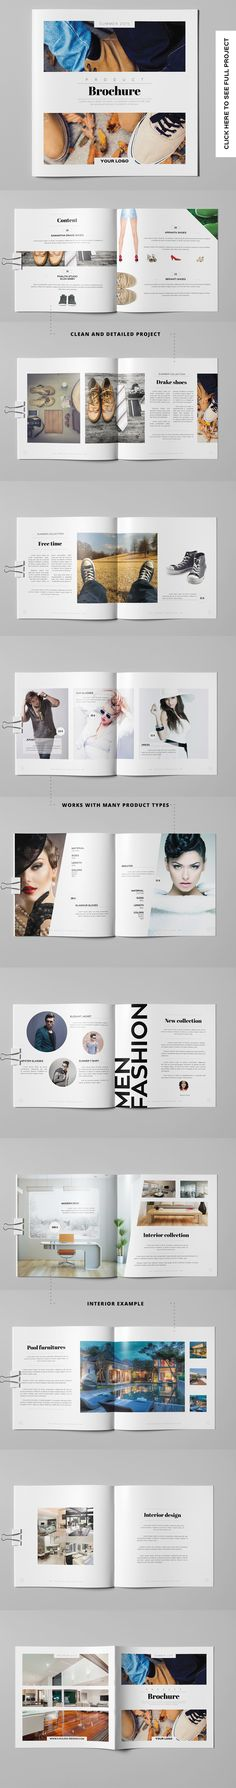 Product Brochure / Catalog by Kahuna Design on @creativemarket